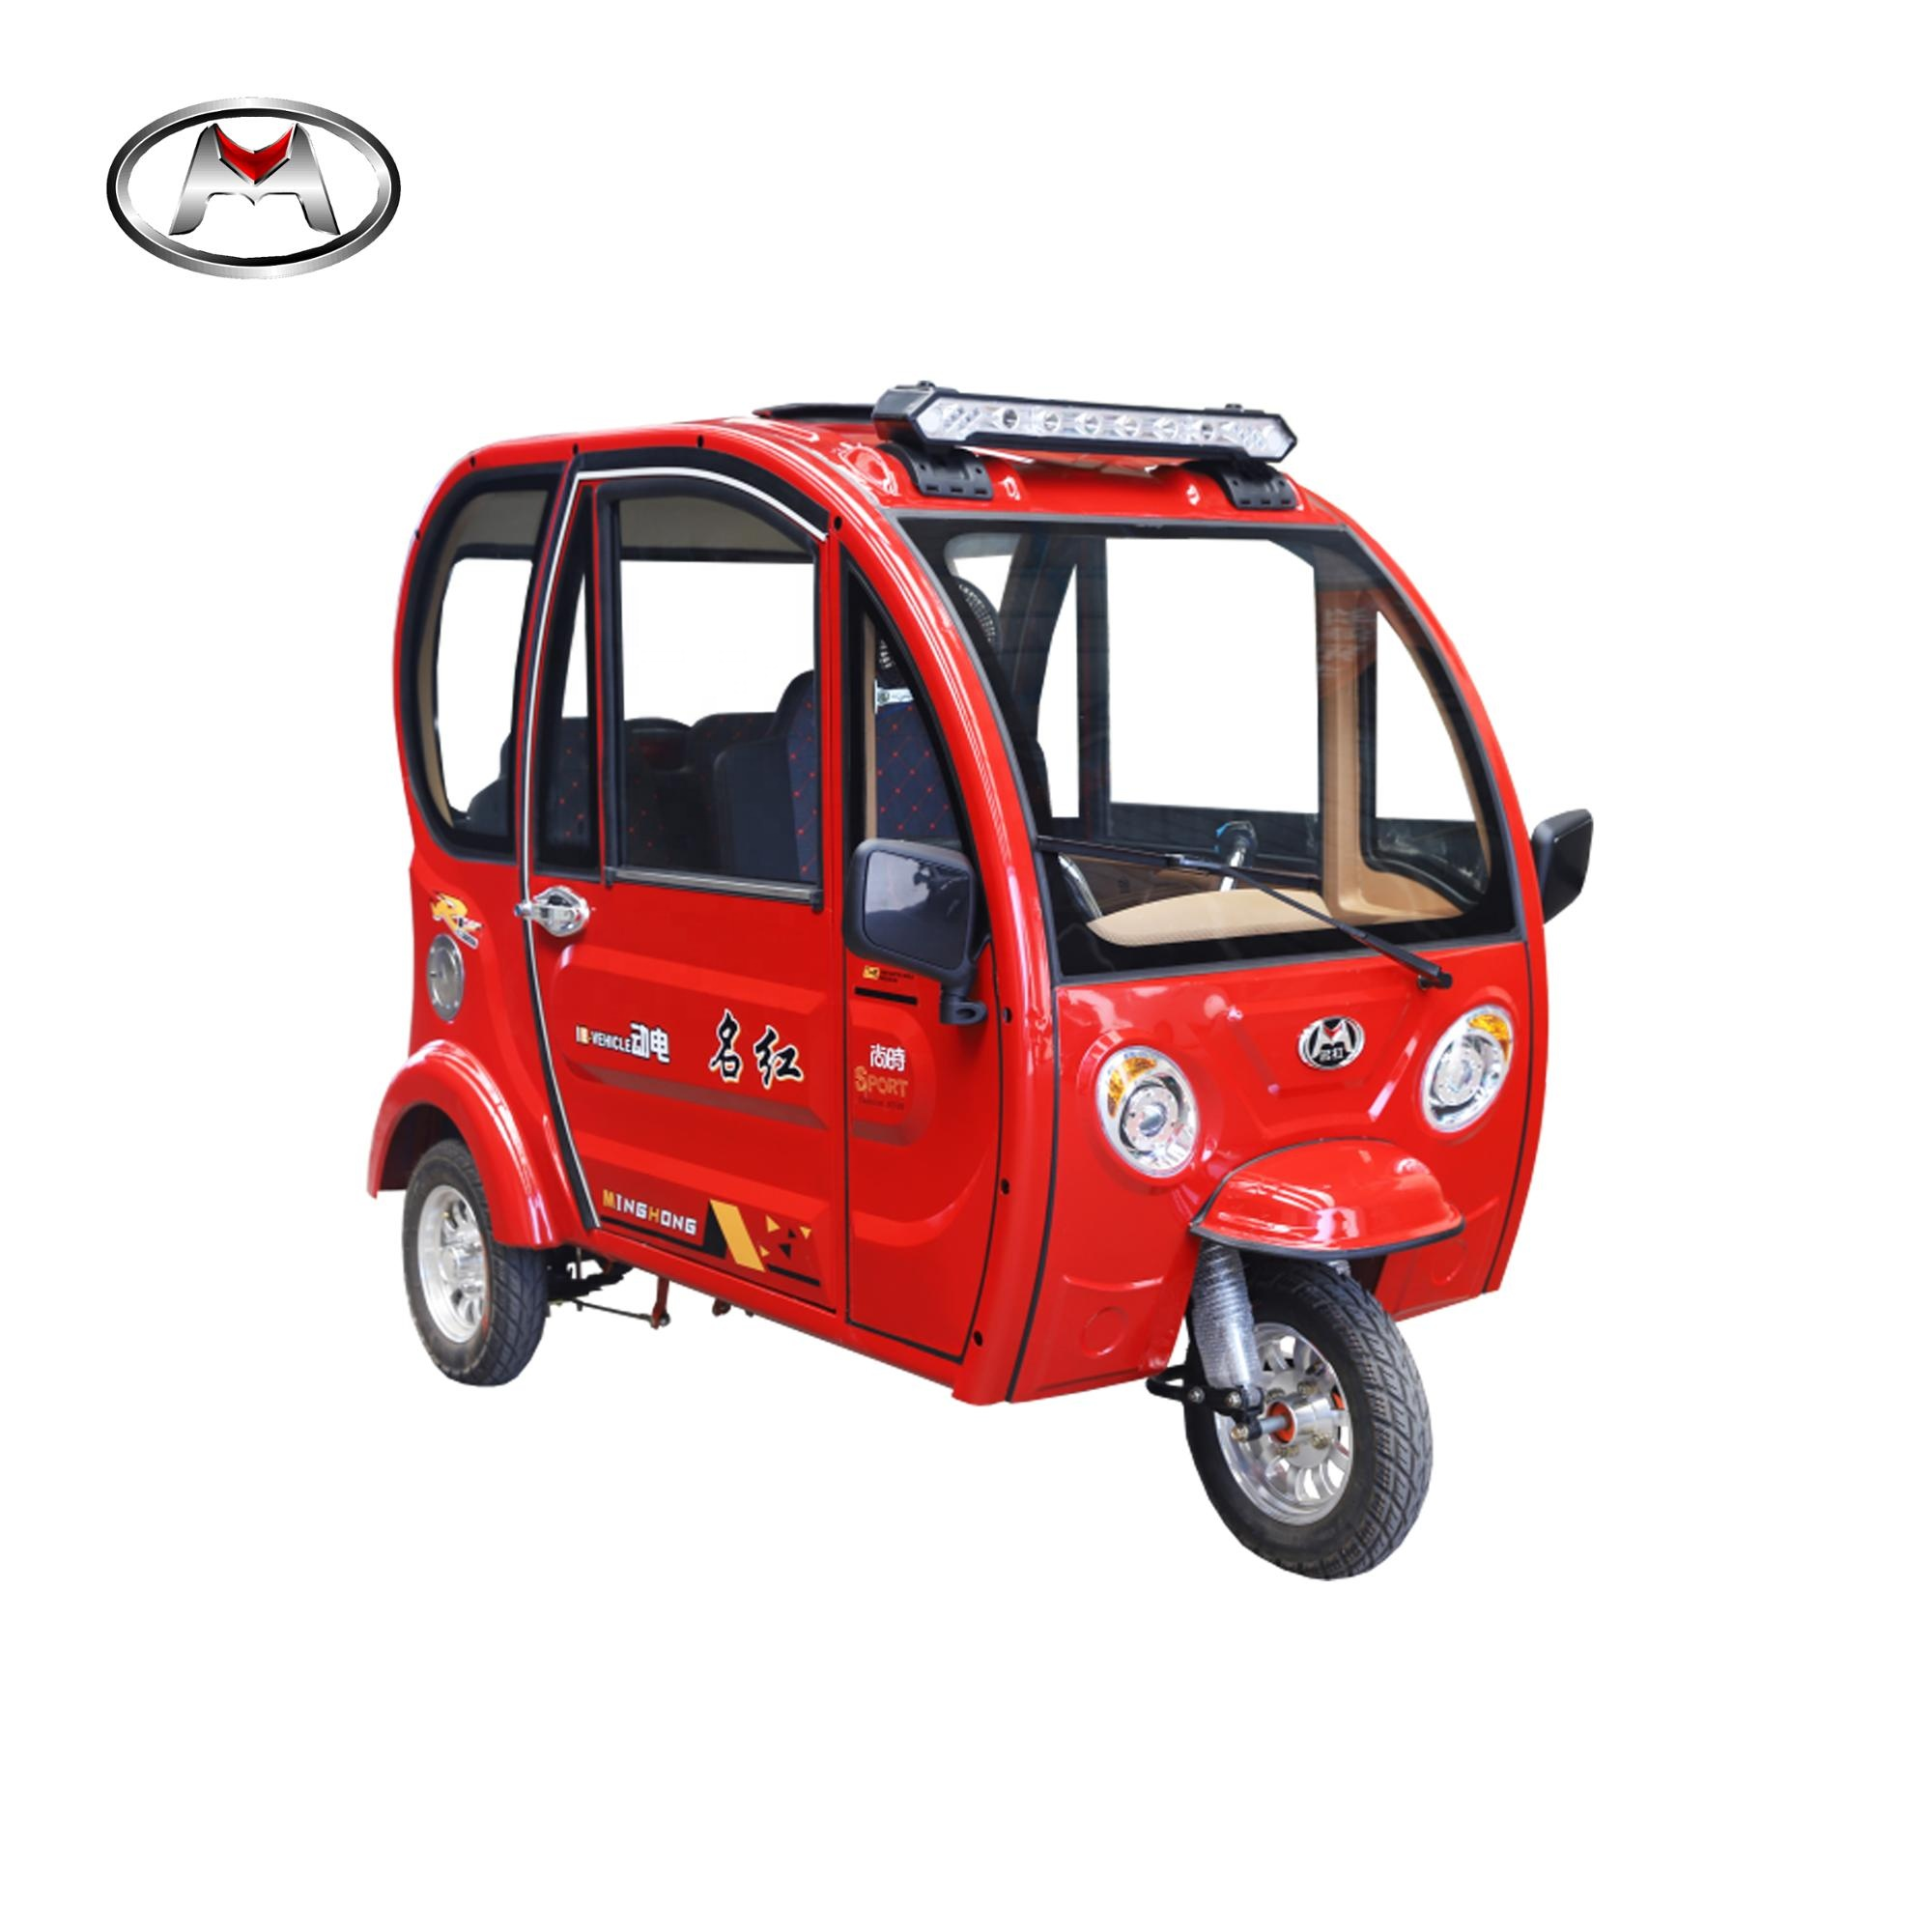 2019 Chinese Bajaj Auto Rickshaw Price Tuk Tuk Bajaj India Best Price Adult Electric Auto Rickshaw In Phil Buy Tuk Tuk Bajaj India For Sale Adult